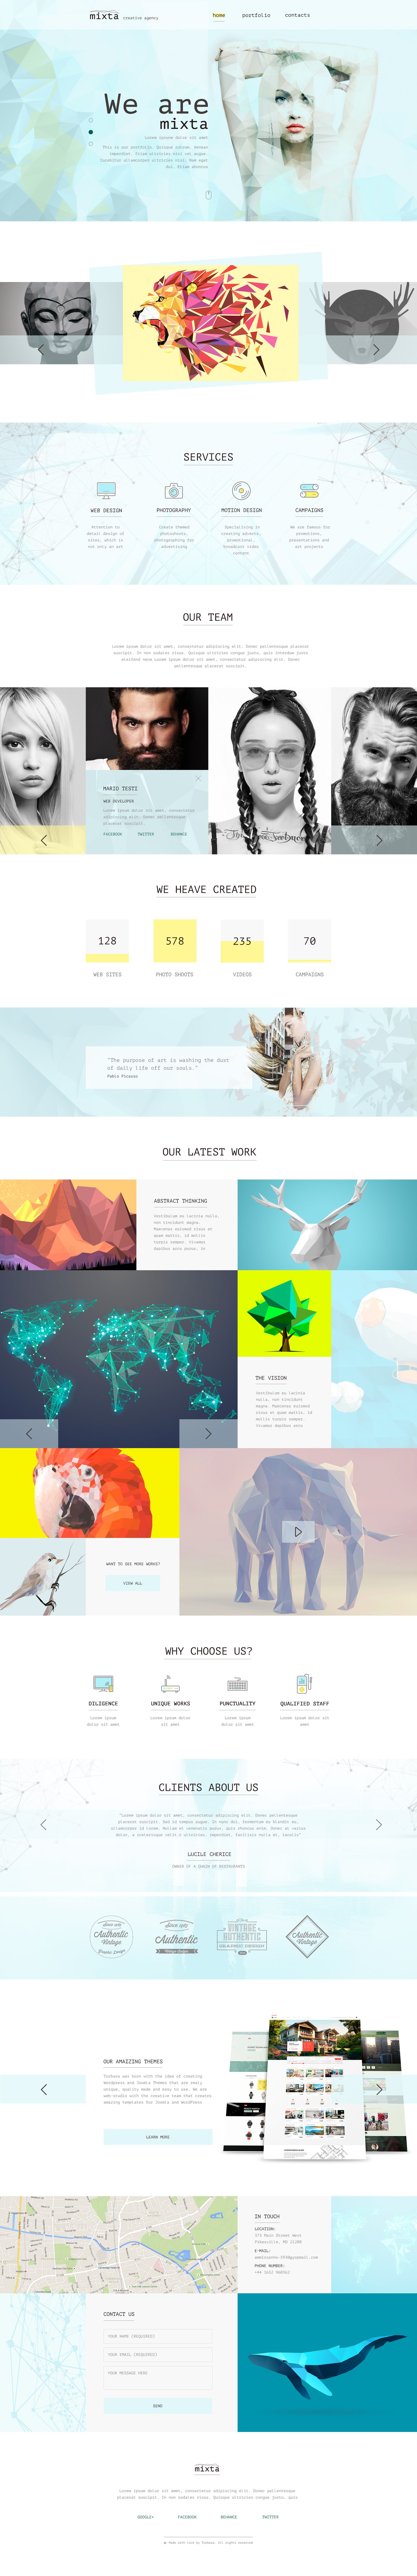 33 Creative Business Logo Designs for Inspiration  48